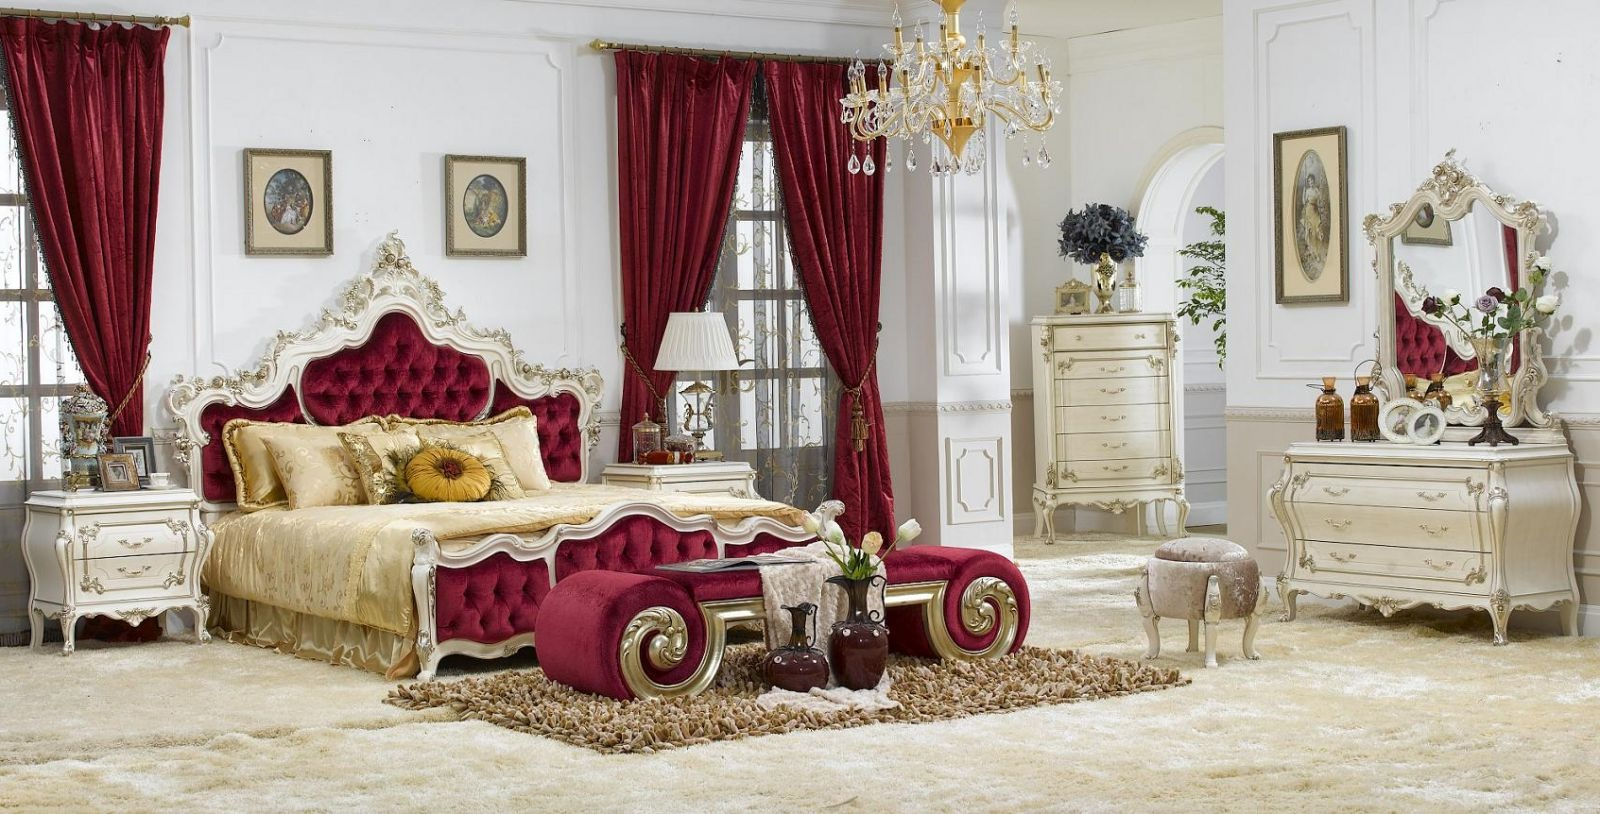 Фото дорогой мебели